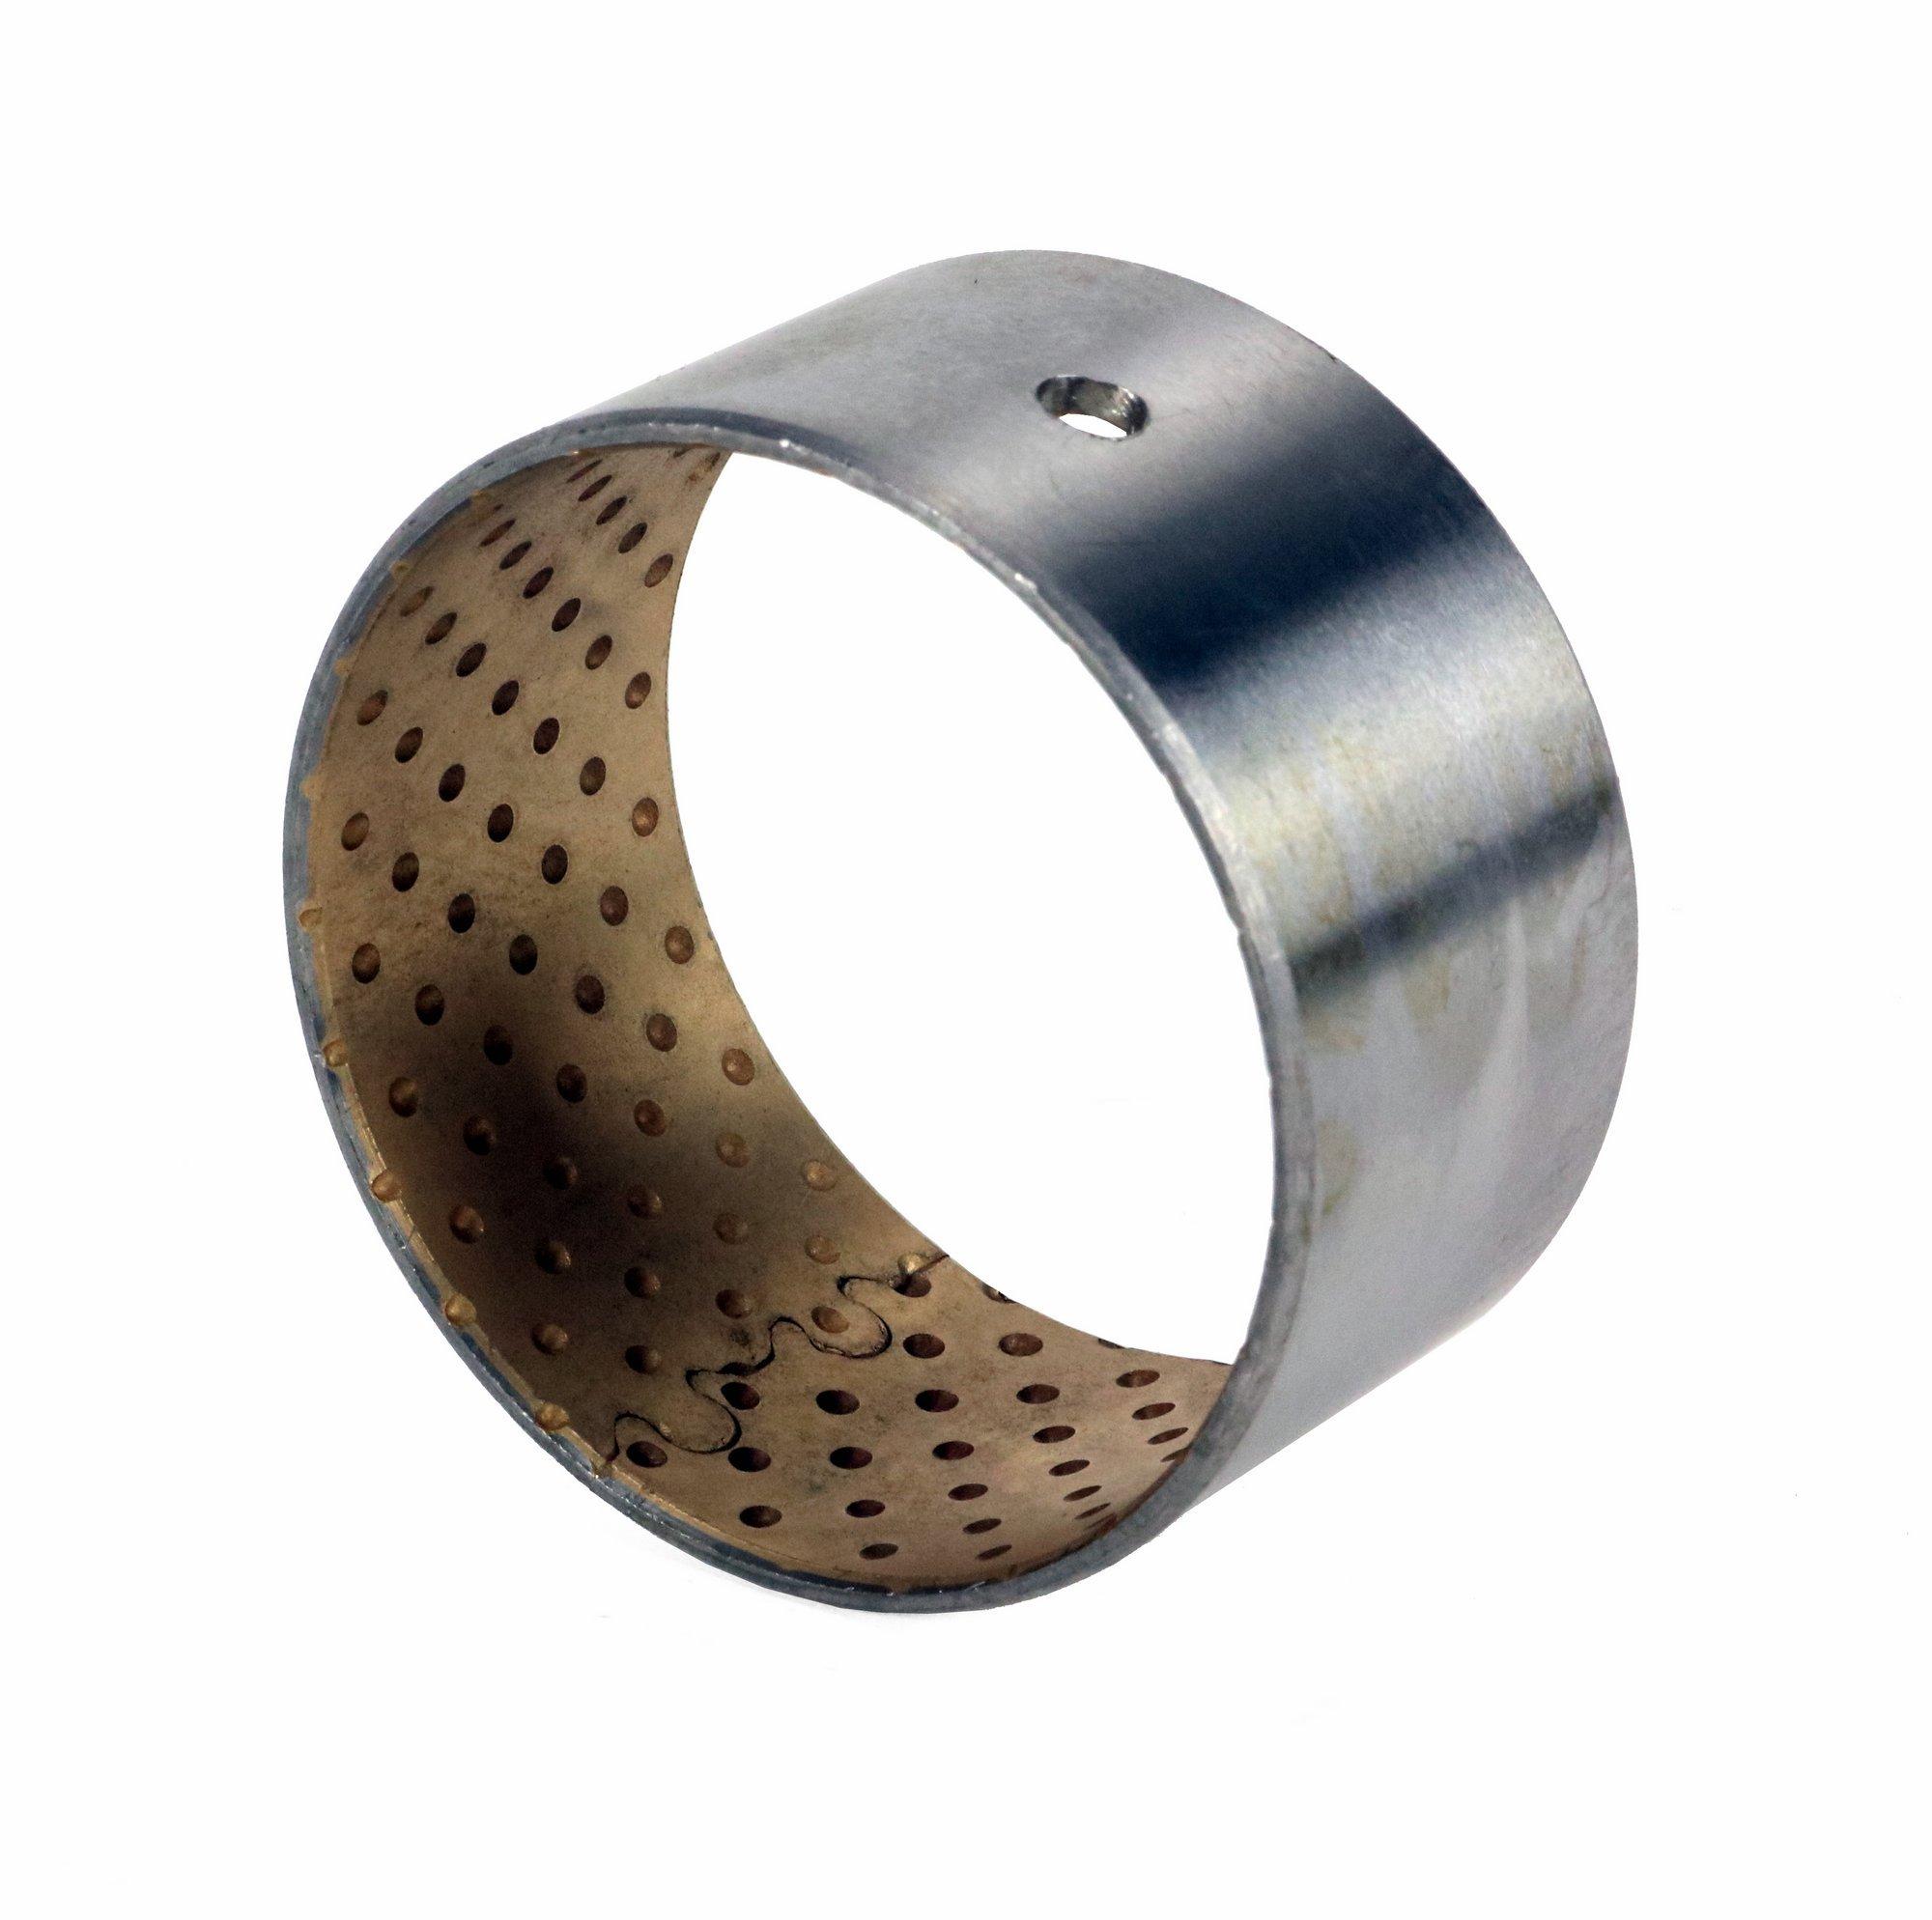 Toledo Pipe 45335 Bronze Rear Bearing fits RIDGID 300 Pipe Threading Machine